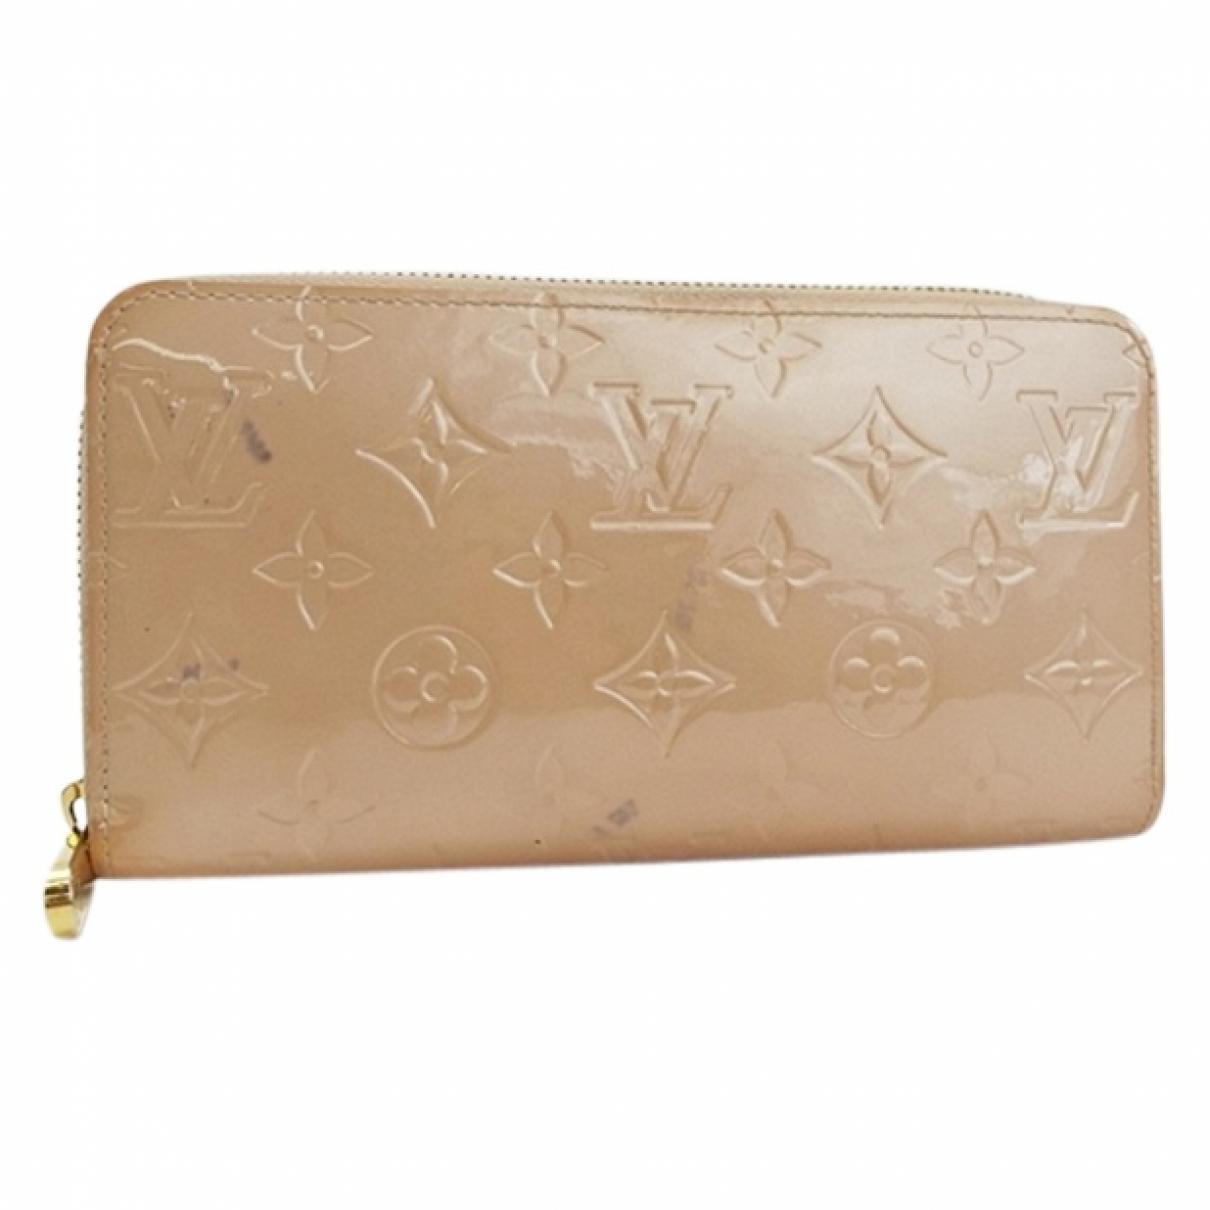 Louis Vuitton Zippy Beige Patent leather wallet for Women \N